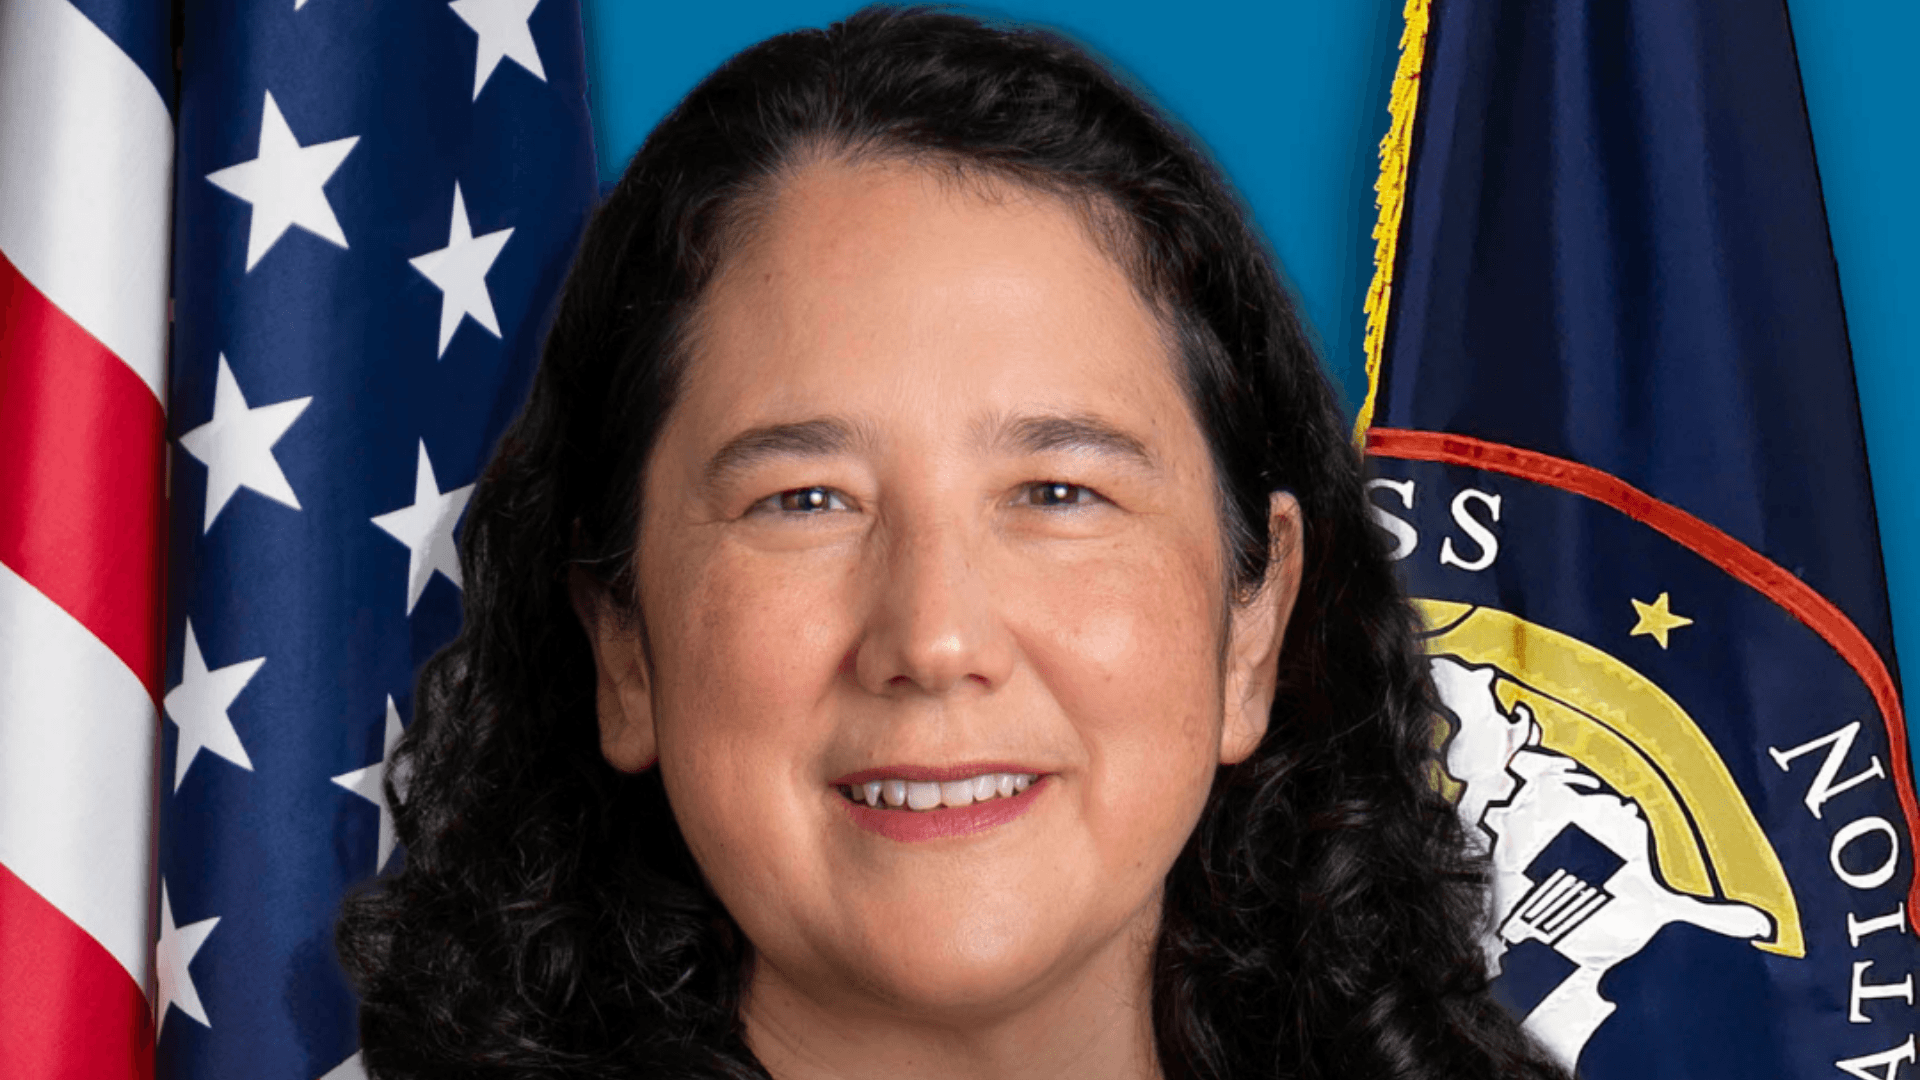 U.S. Small Business Administrator Isabella Guzman